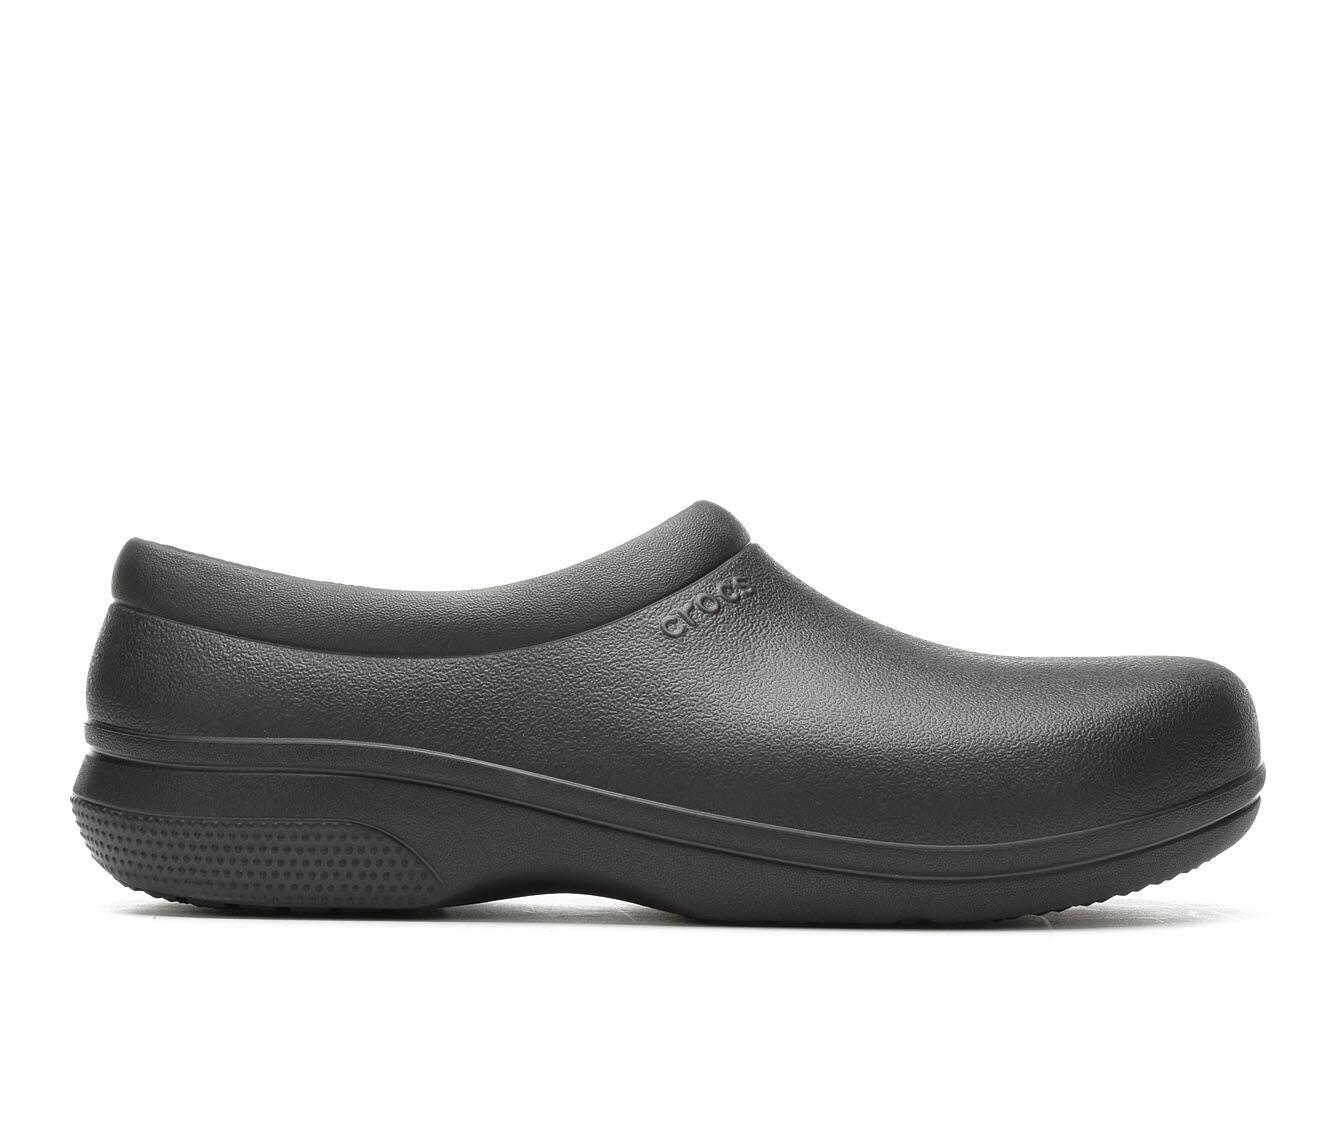 Clock Slip On Safety Shoes | Shoe Carnival